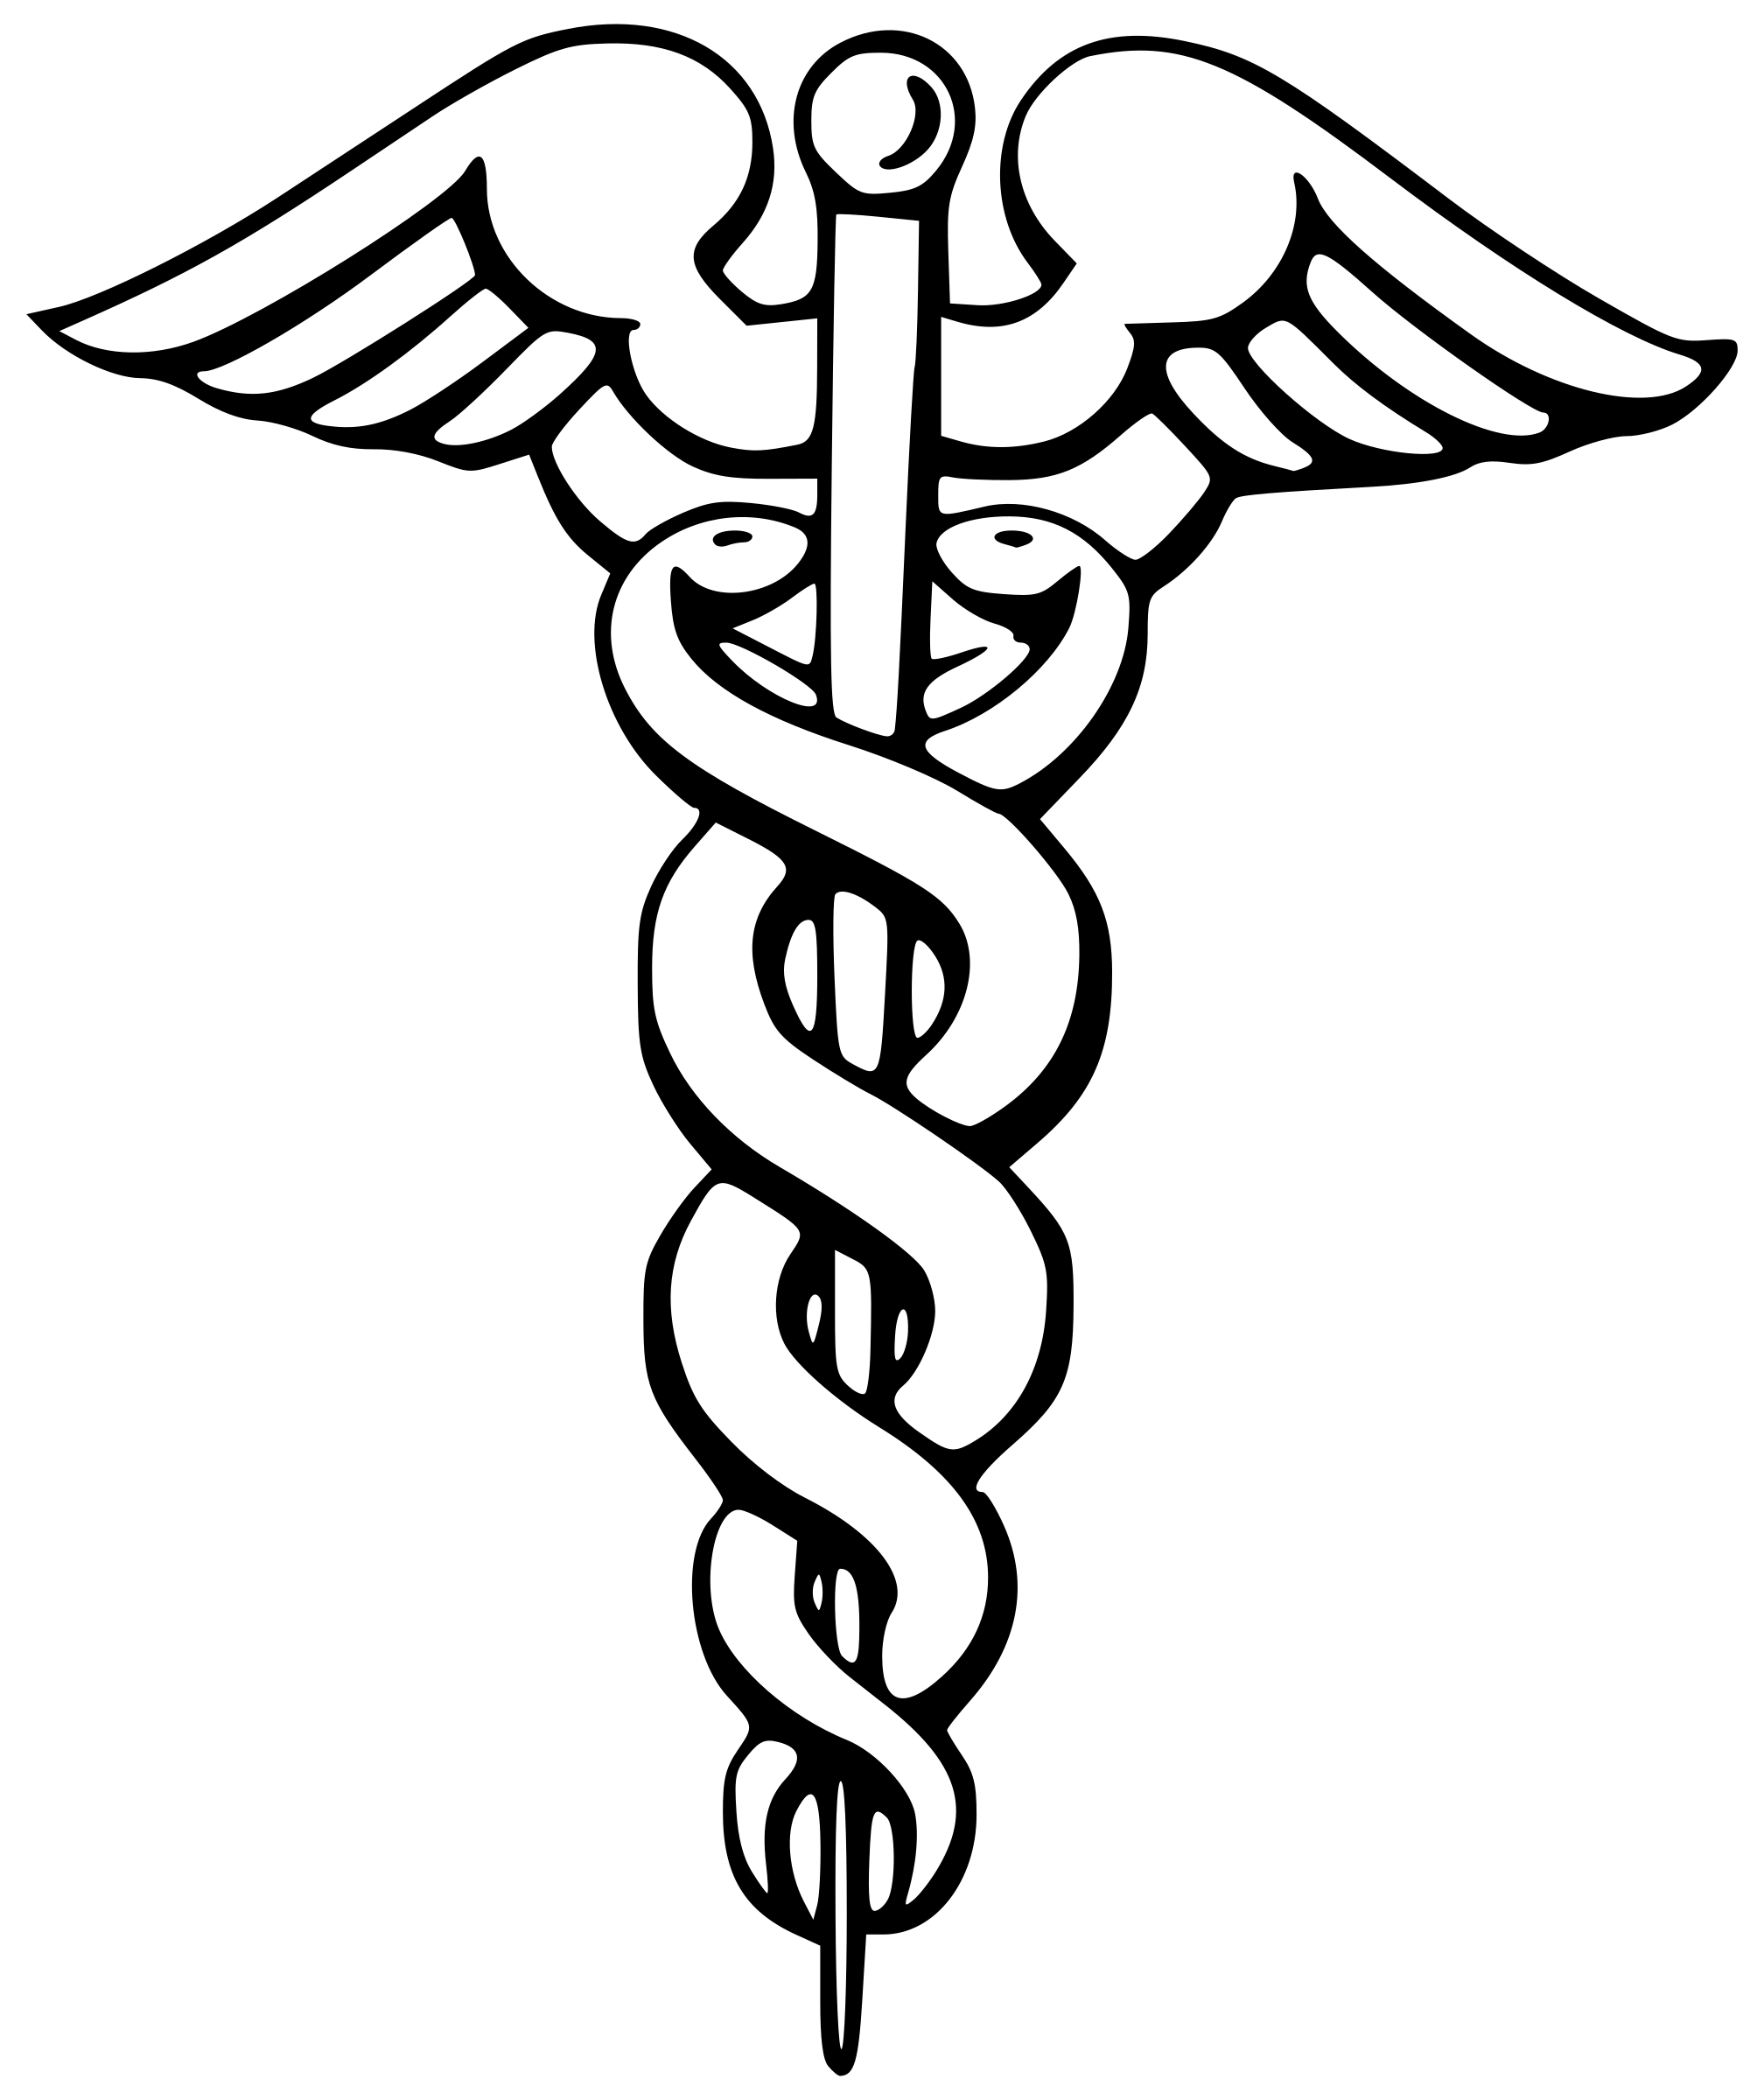 Caduceus Clipart Free Download Clip Art.